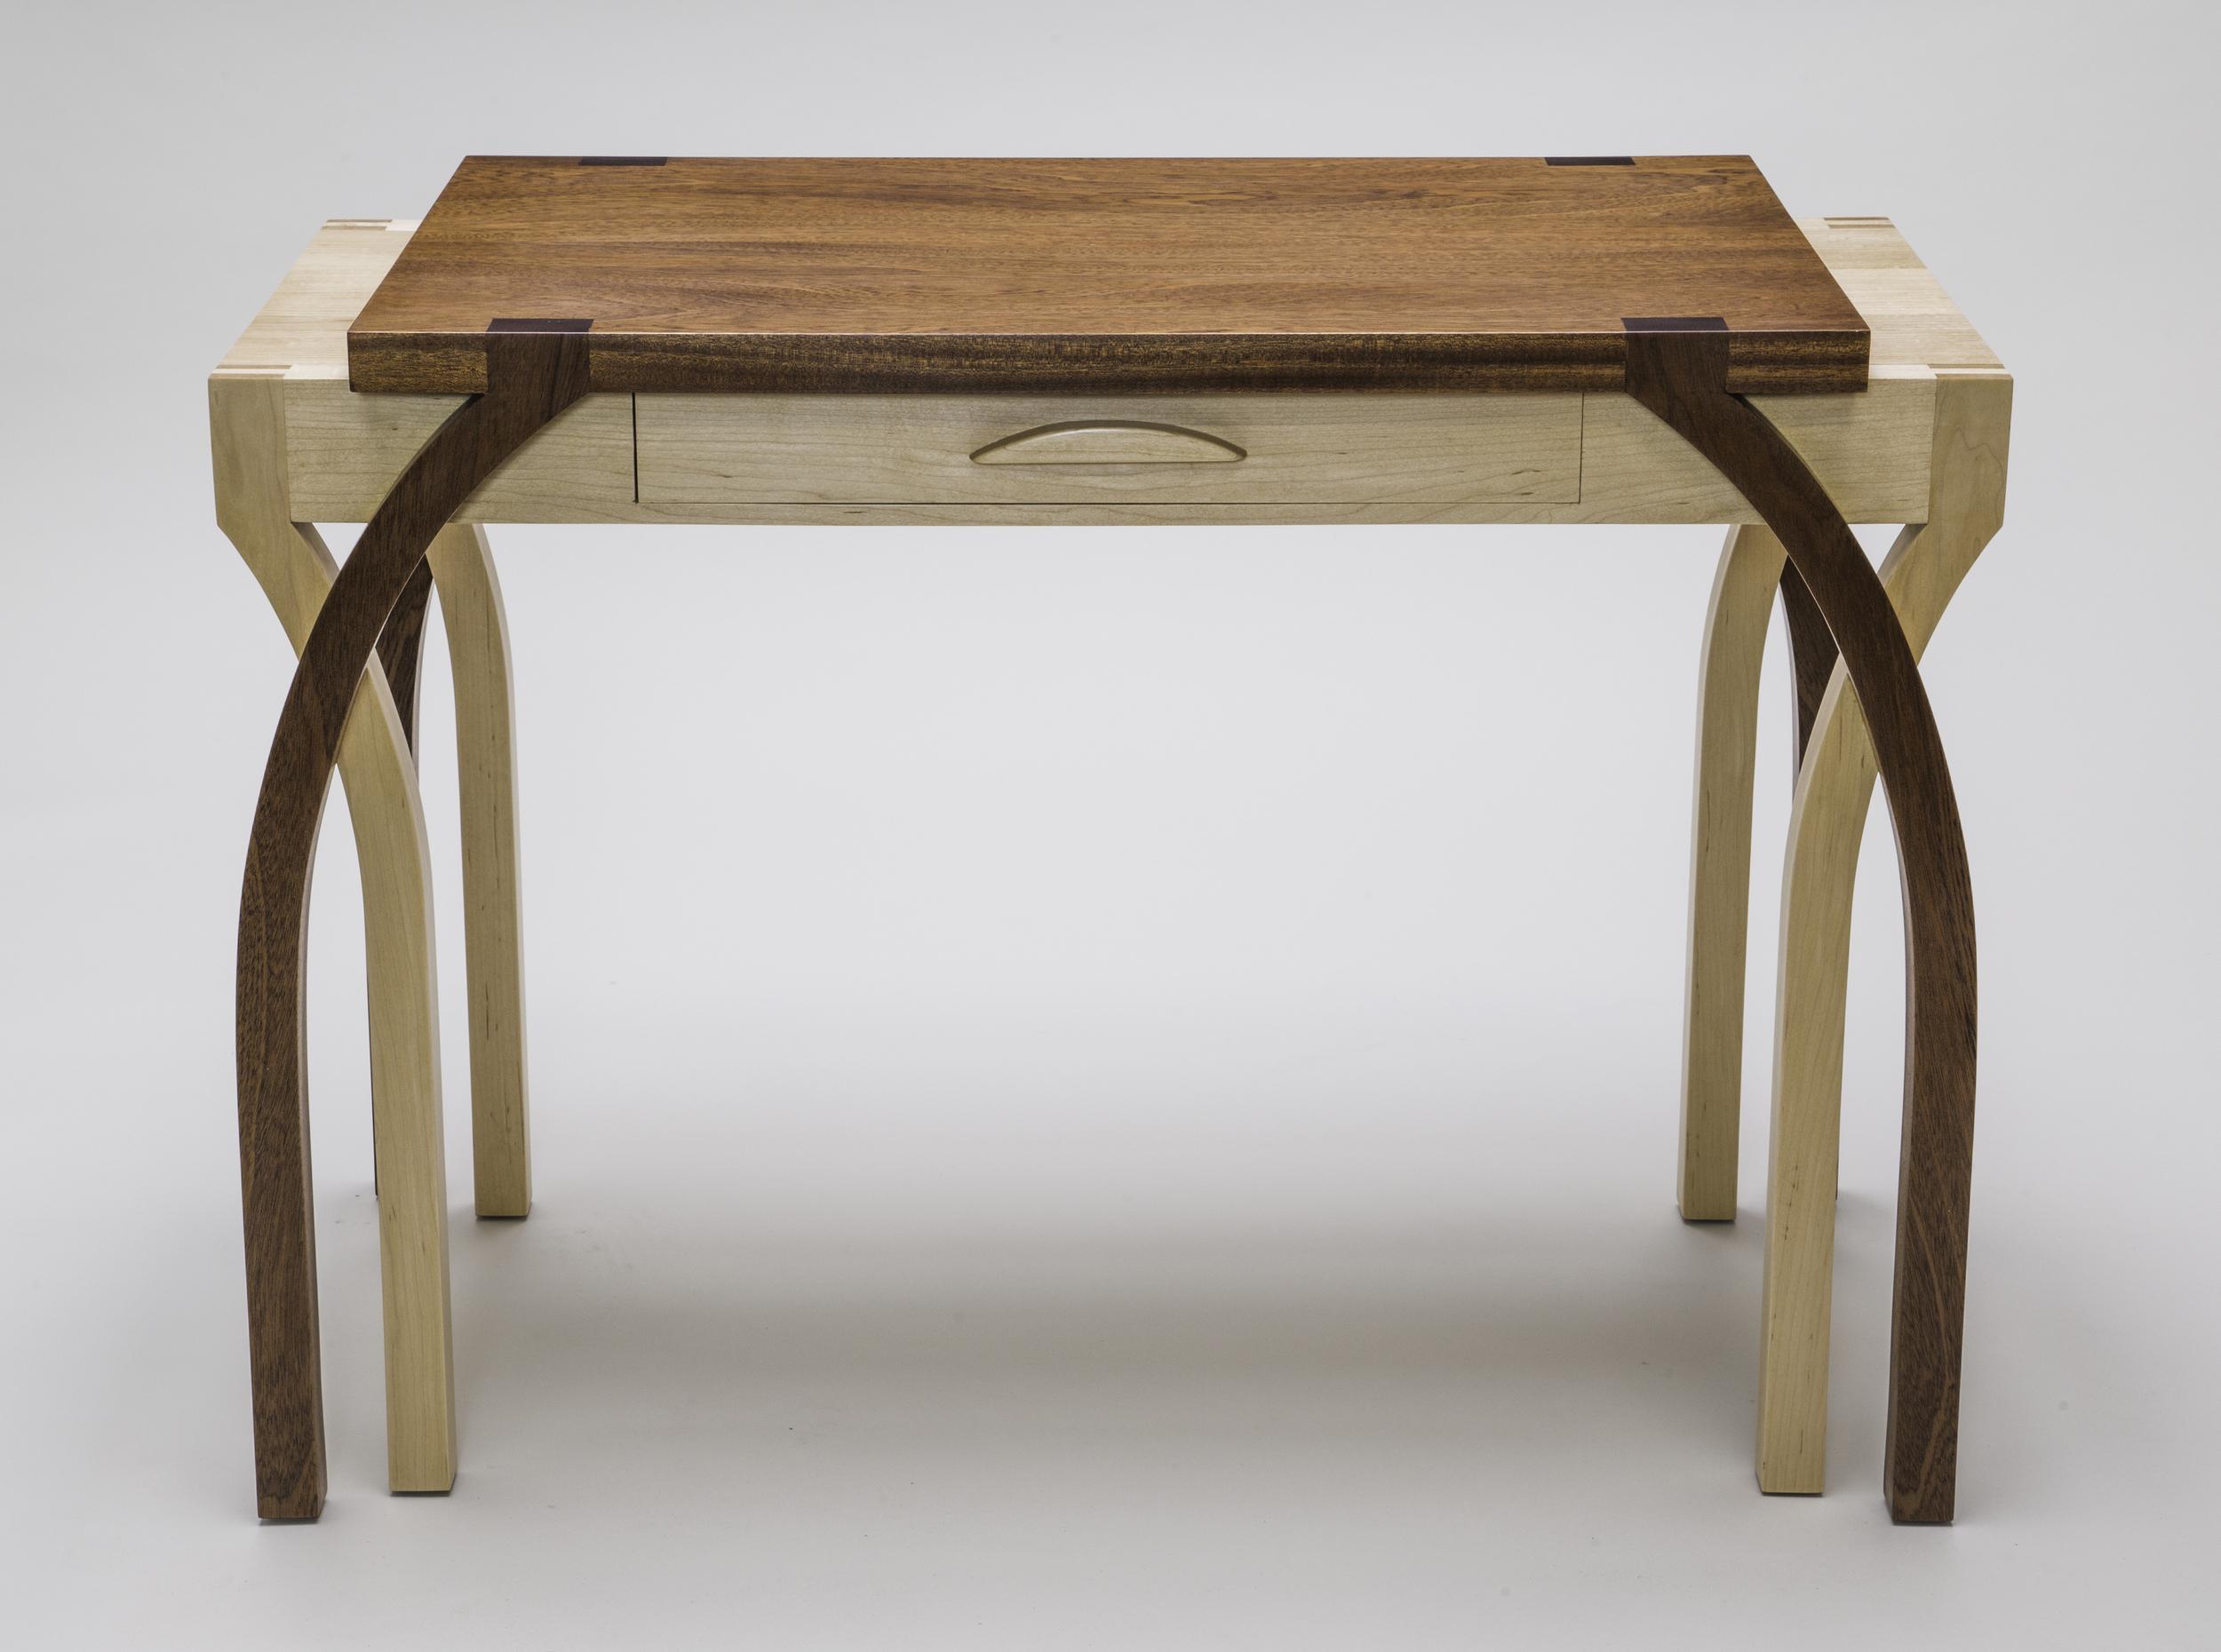 20141028 Taima Krayem, Shaker table, desk-table, 09-25-14 bowl 5.jpg